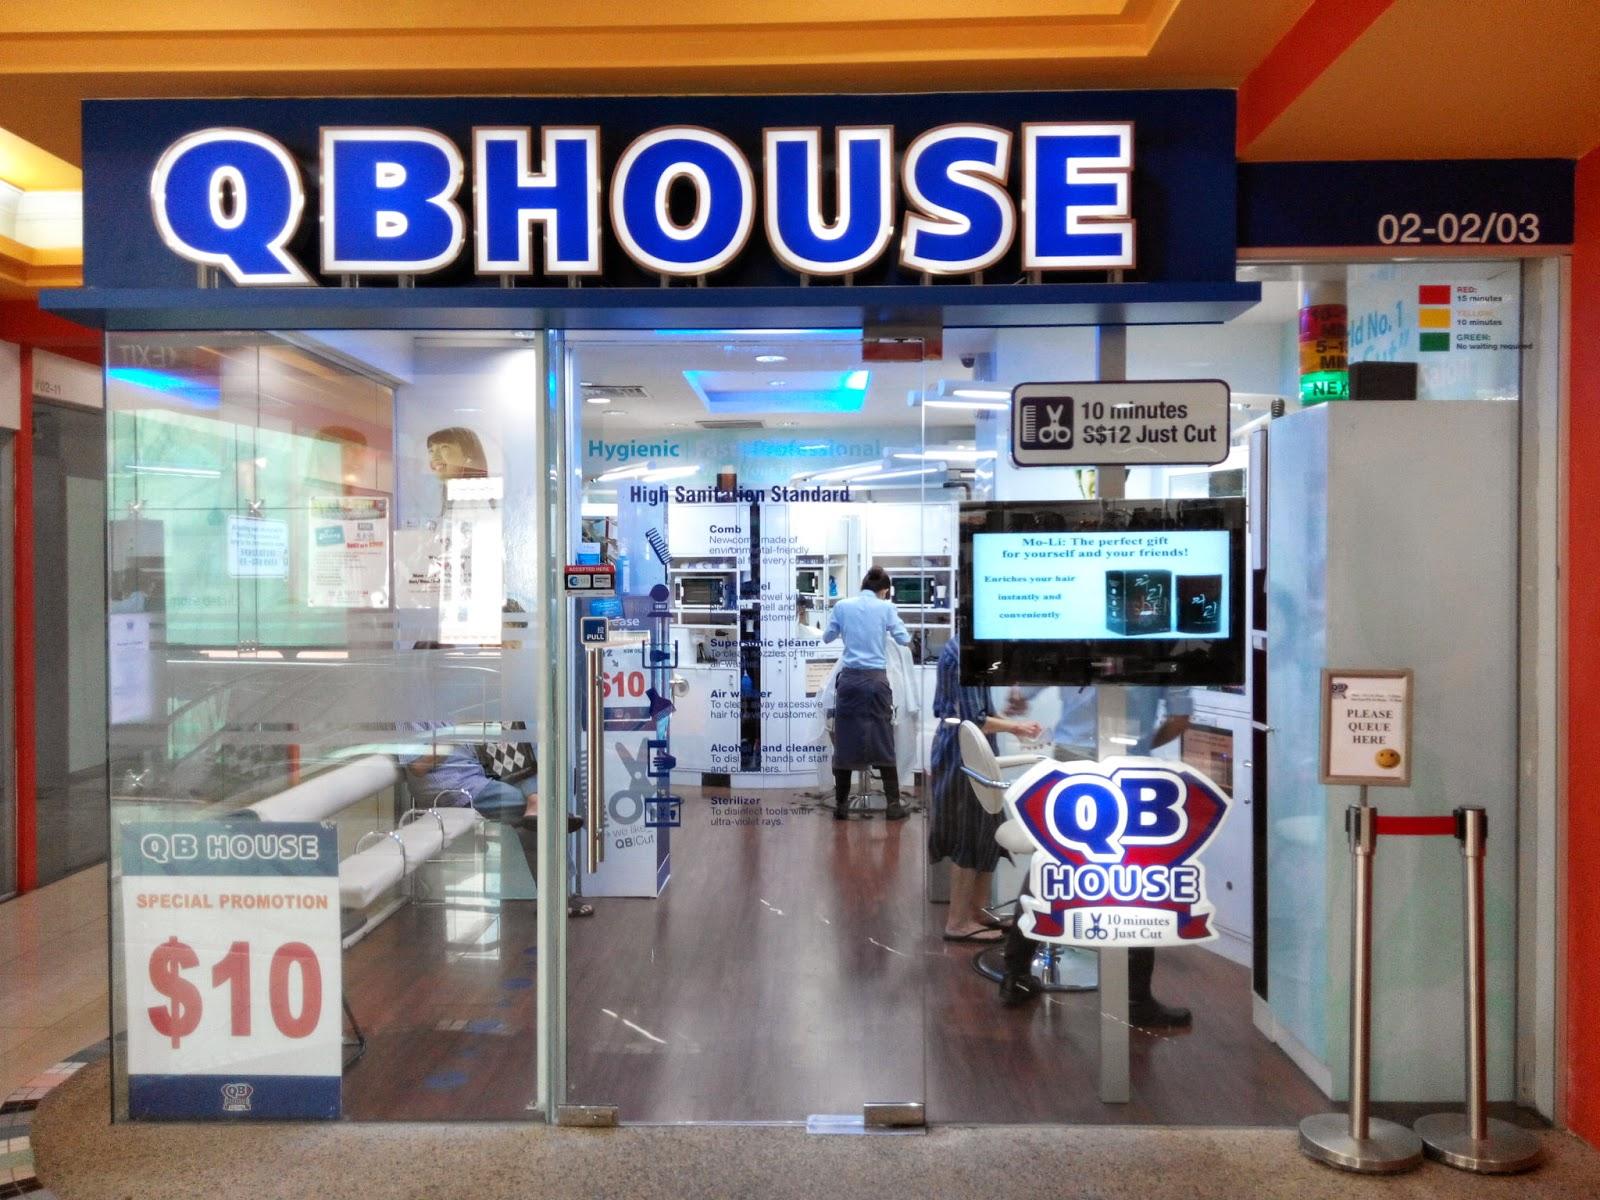 QB House barbershop, Holland Village outlet, Singapore